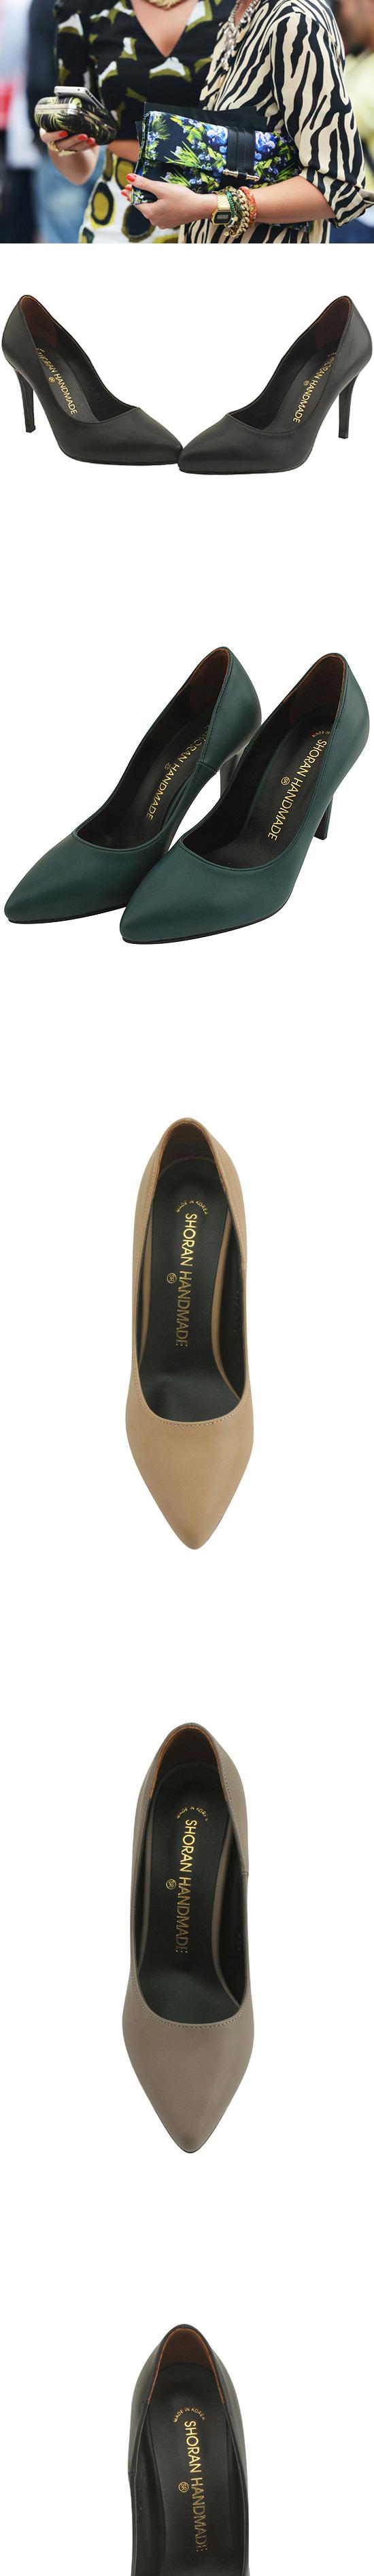 Minimalist Stiletto High Heels 9cm Turquoise